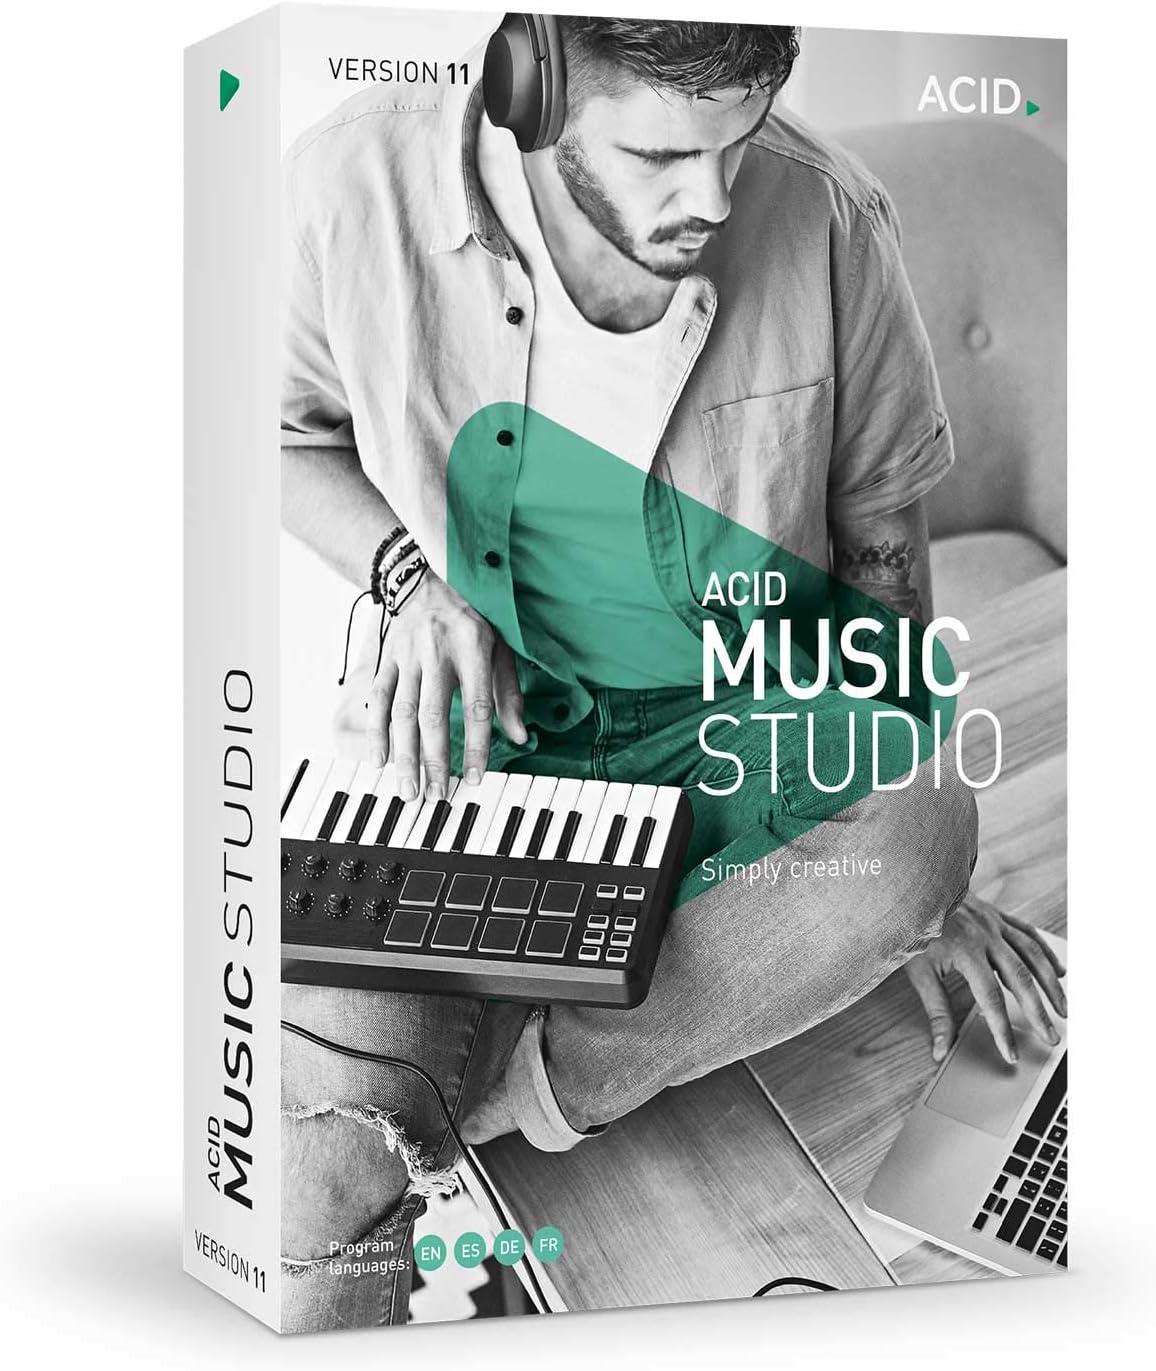 Acid Music Studio - Version 11 - Simply Creative